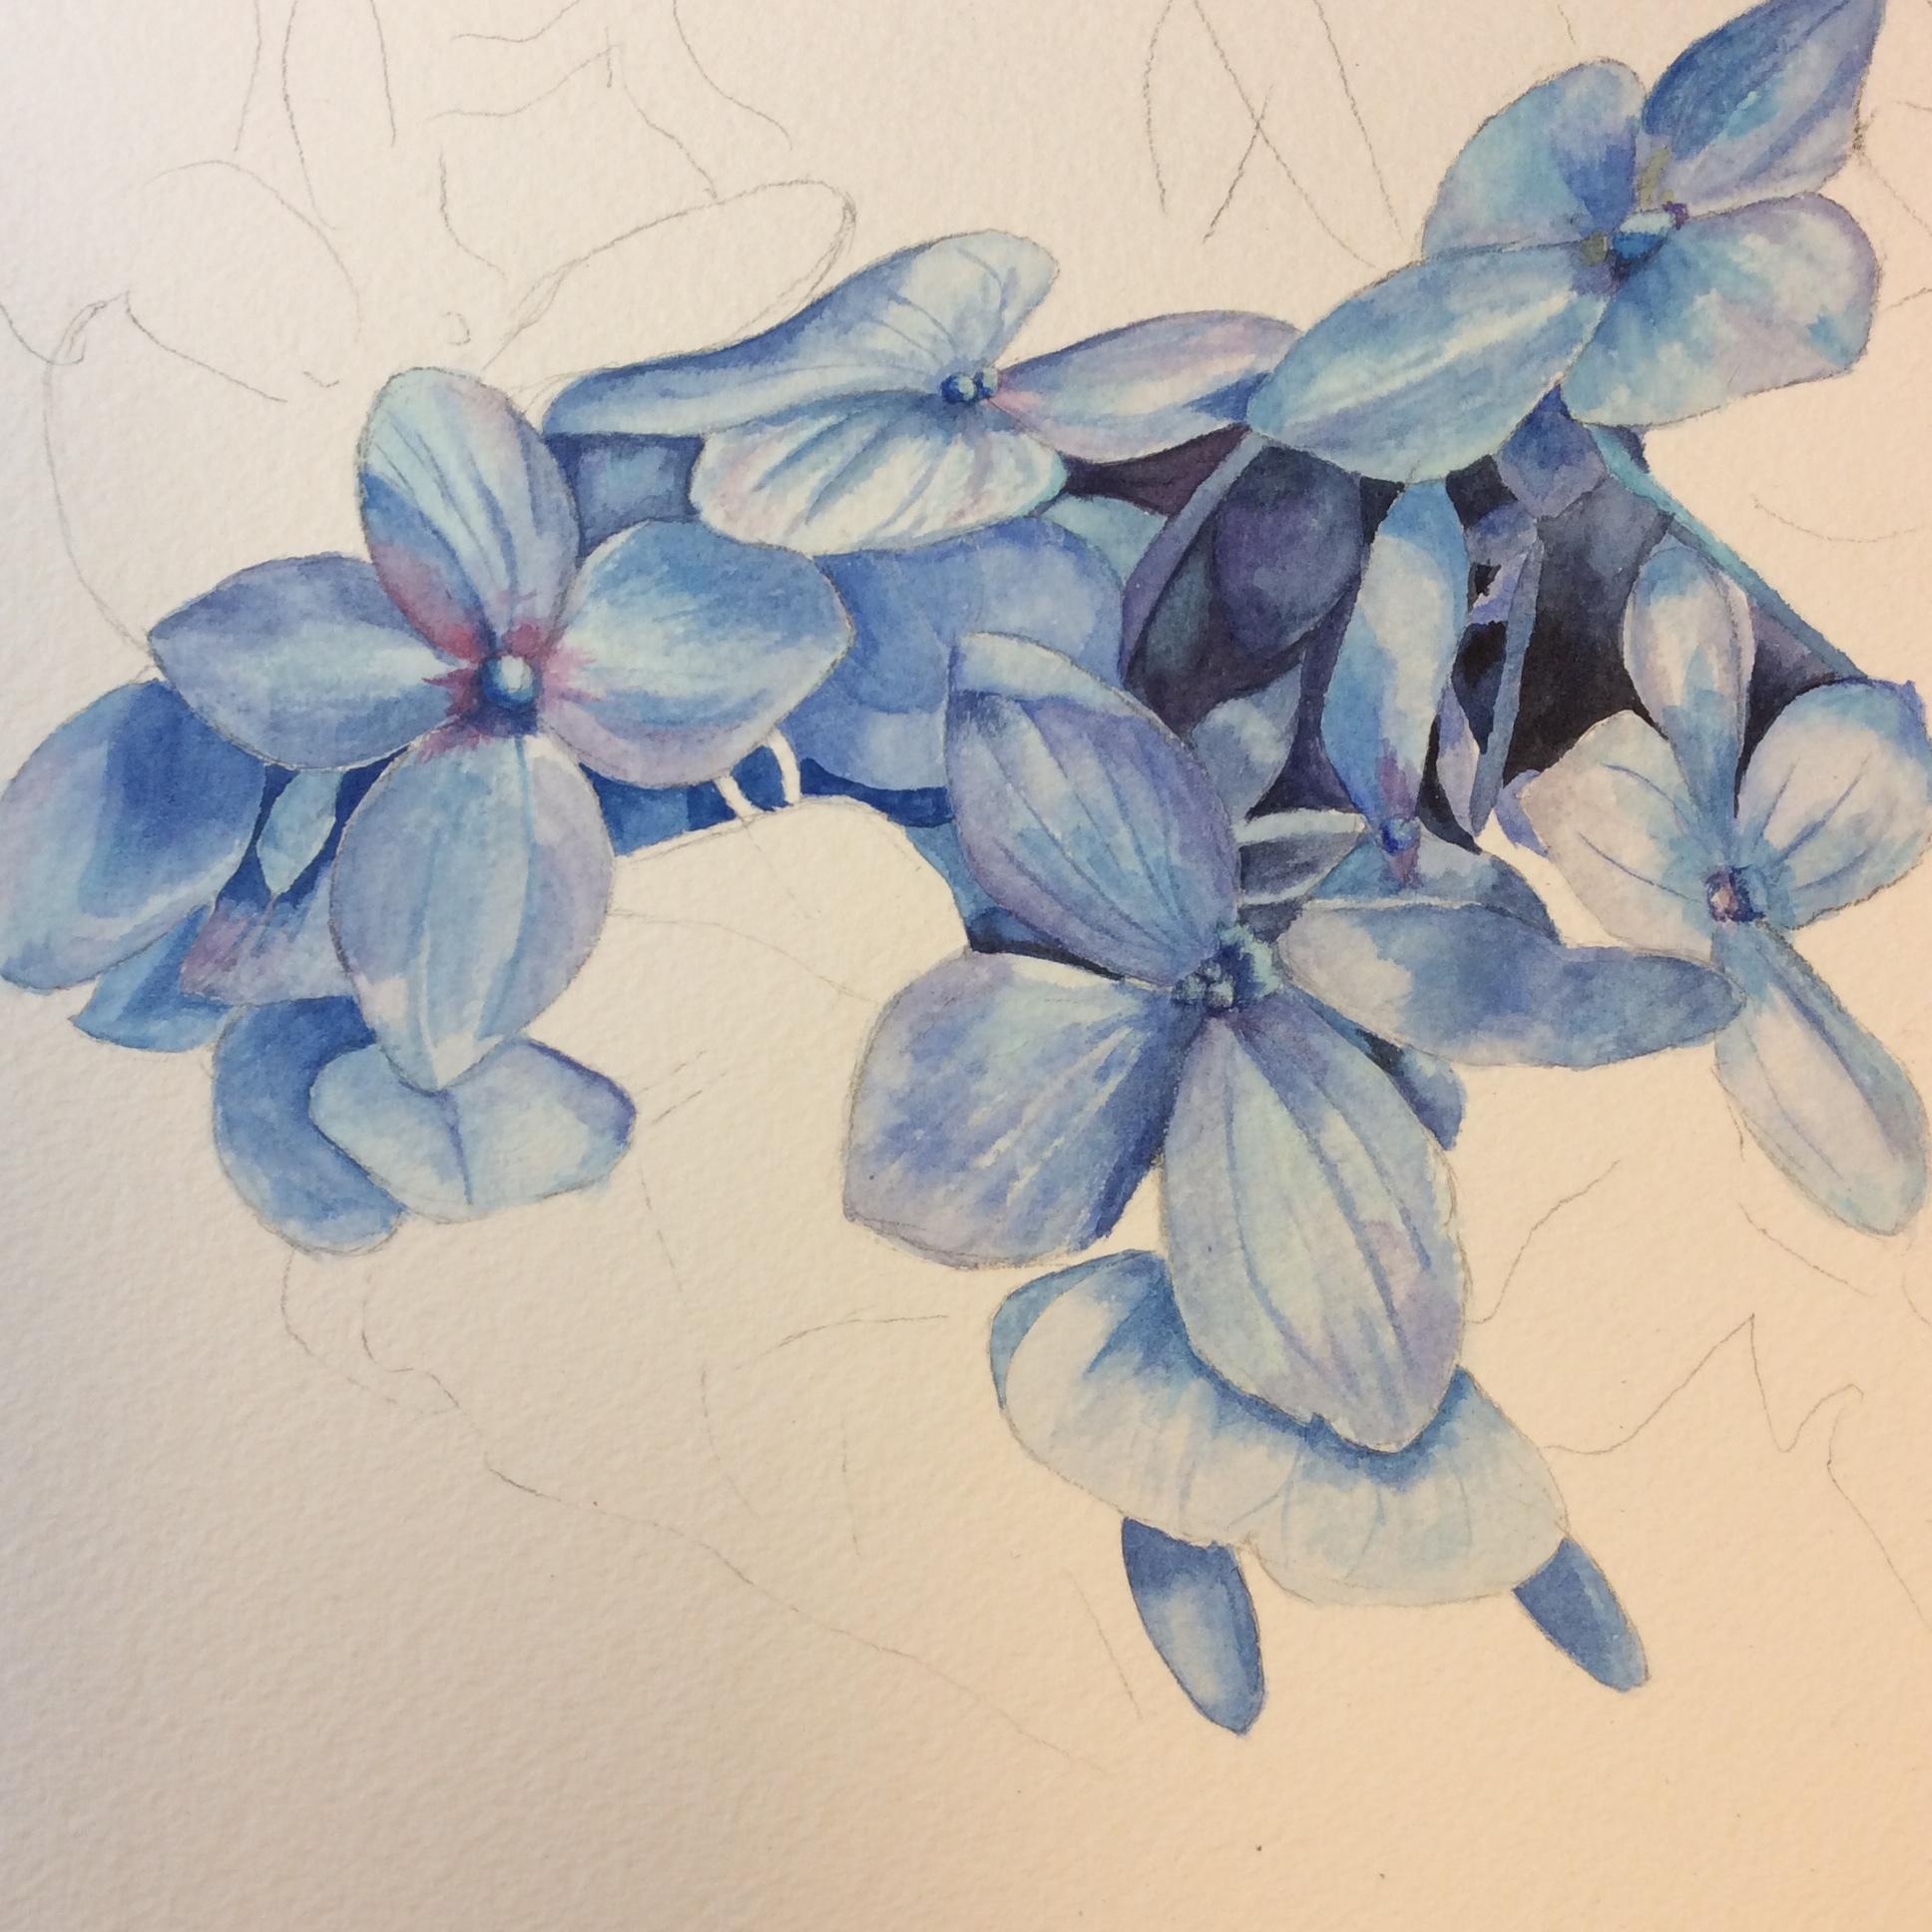 Amethyst Shades of Blue by Helen Shideler